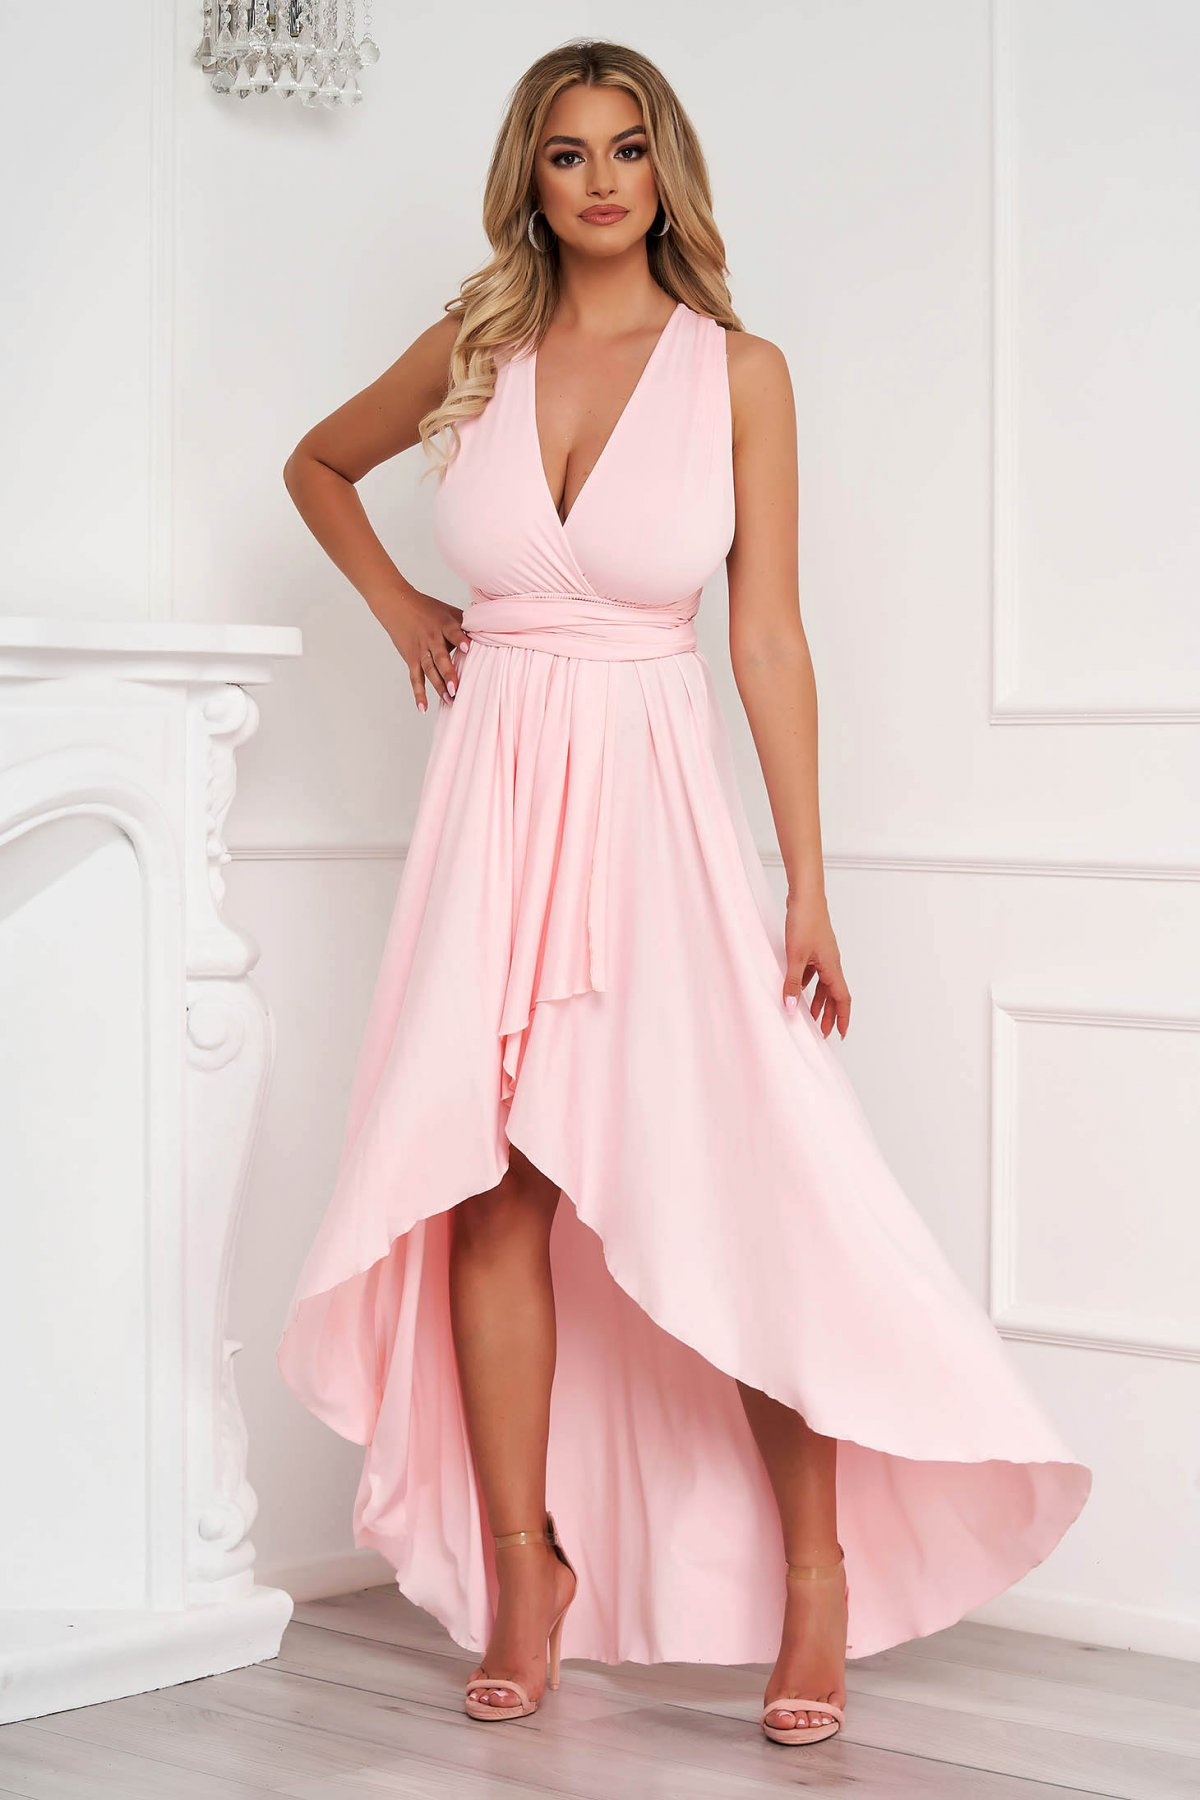 Rochie Lady Pandora roz deschis asimetrica de ocazie in clos din material elastic cu spatele gol